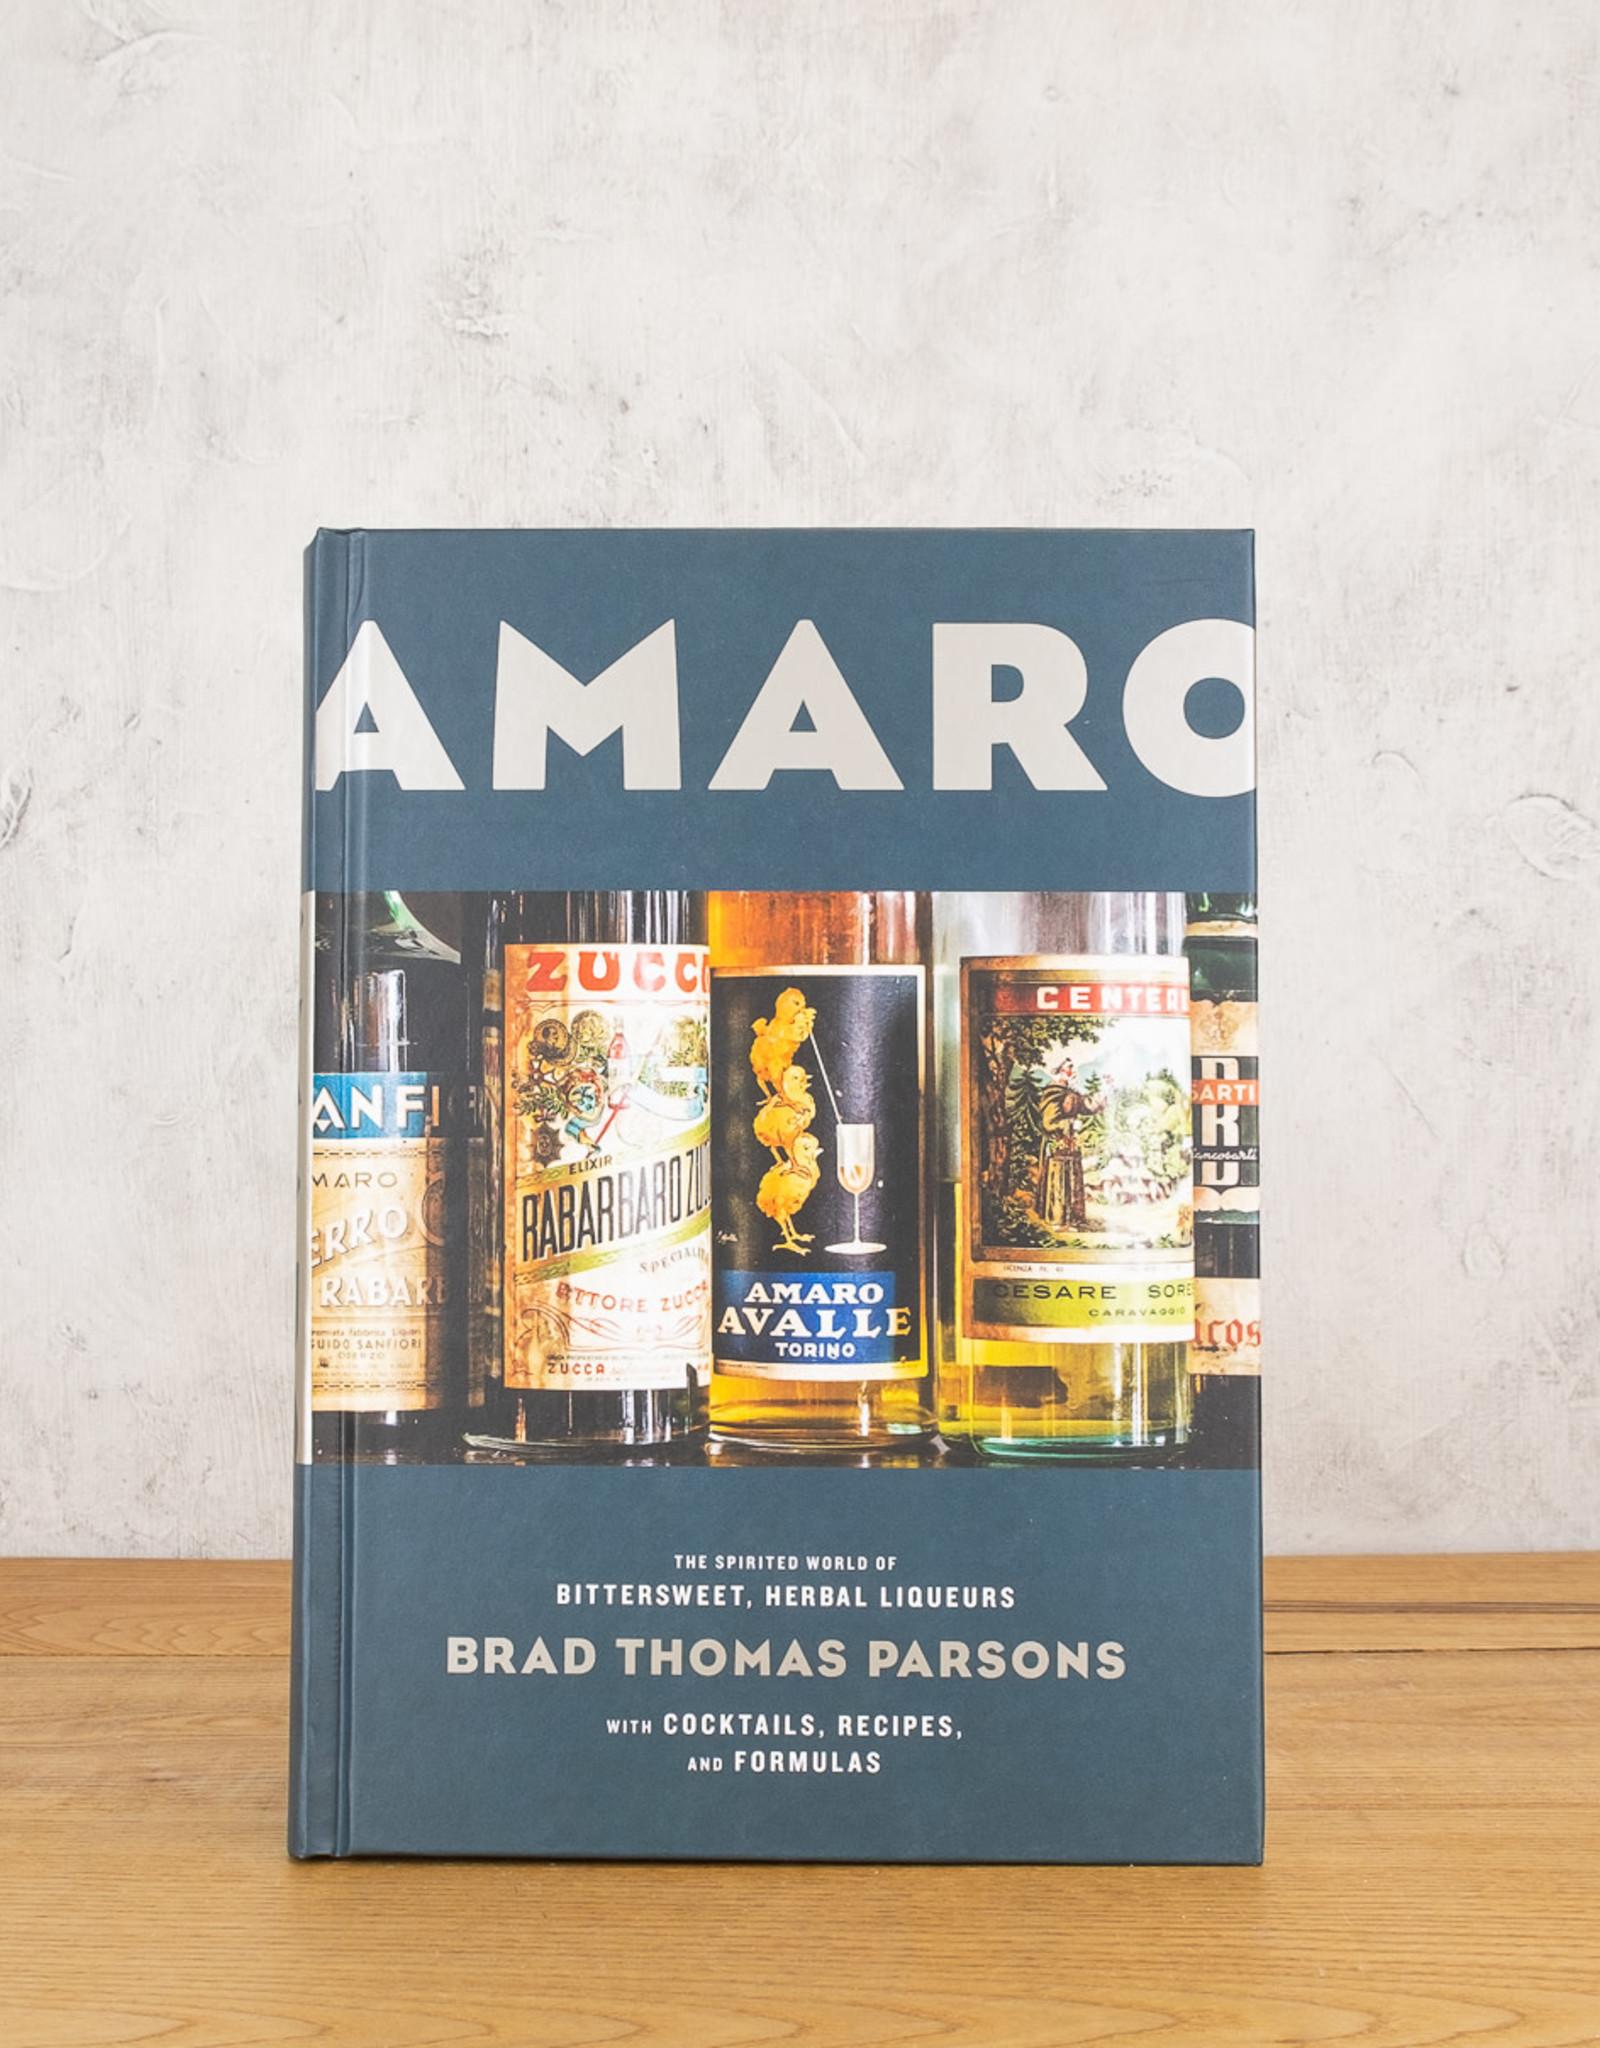 Amaro : The Spirited World of Bittersweet, Herbal Liqueurs